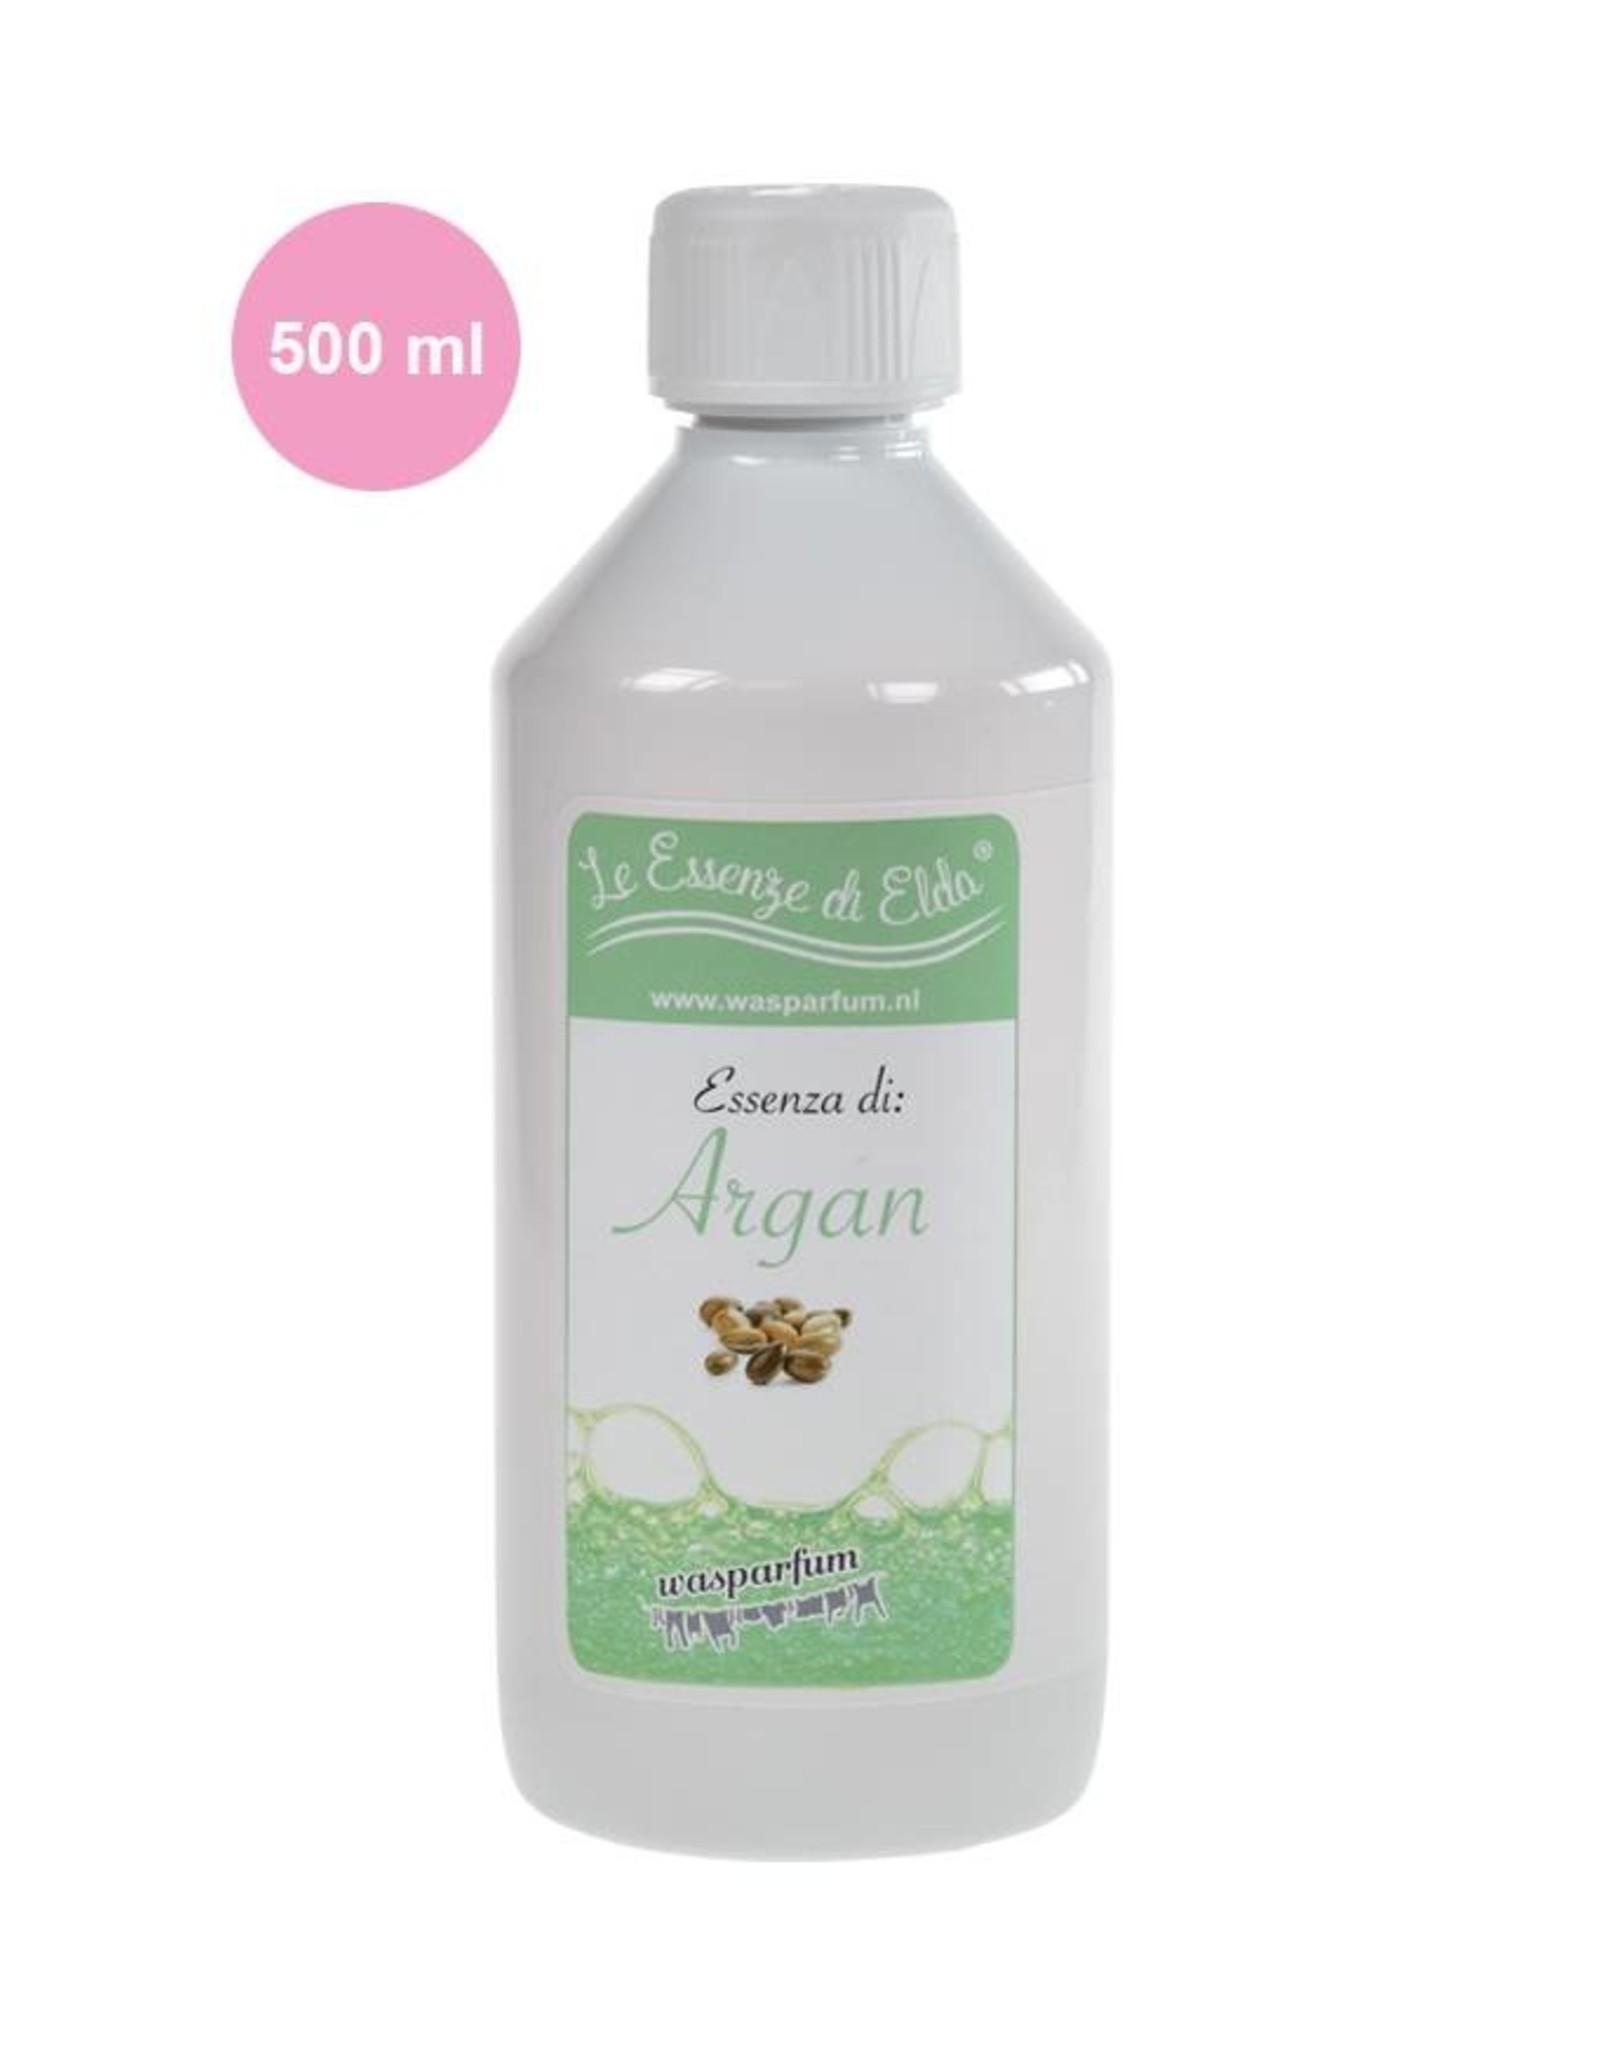 Wasparfum Fles Argan Wasparfum